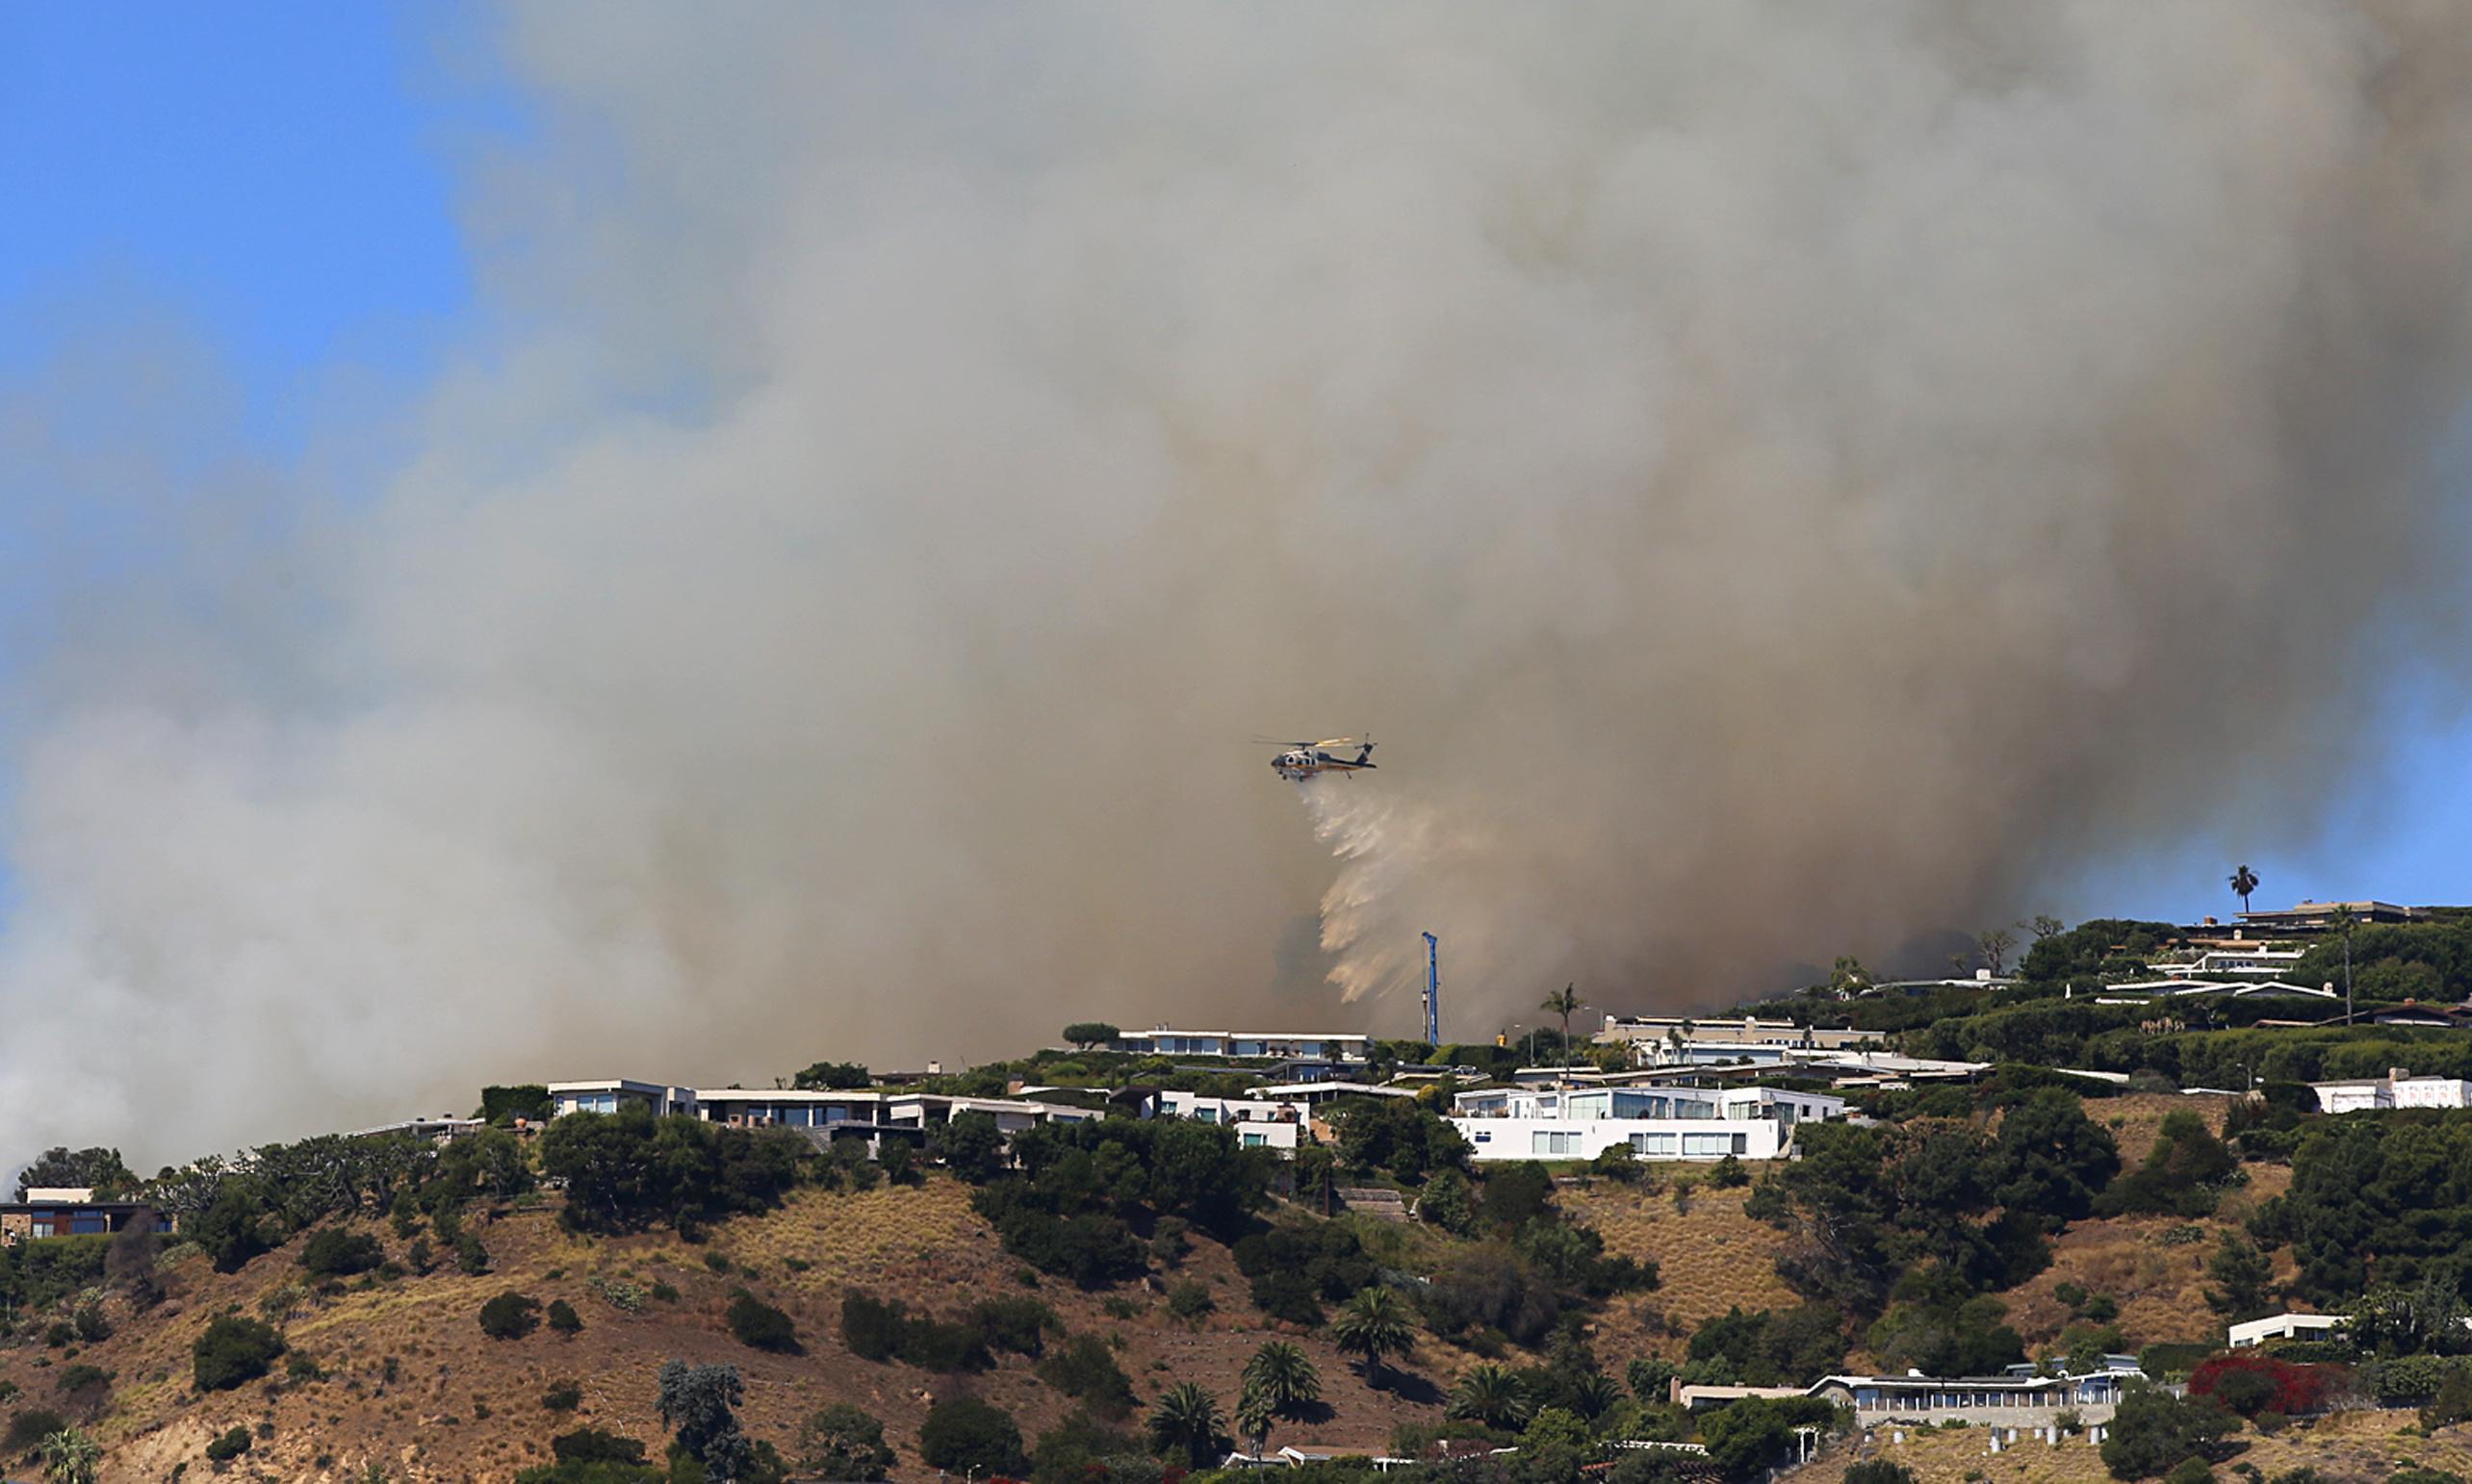 Wildfire burns Los Angeles area hillside, threatening multimillion-dollar homes